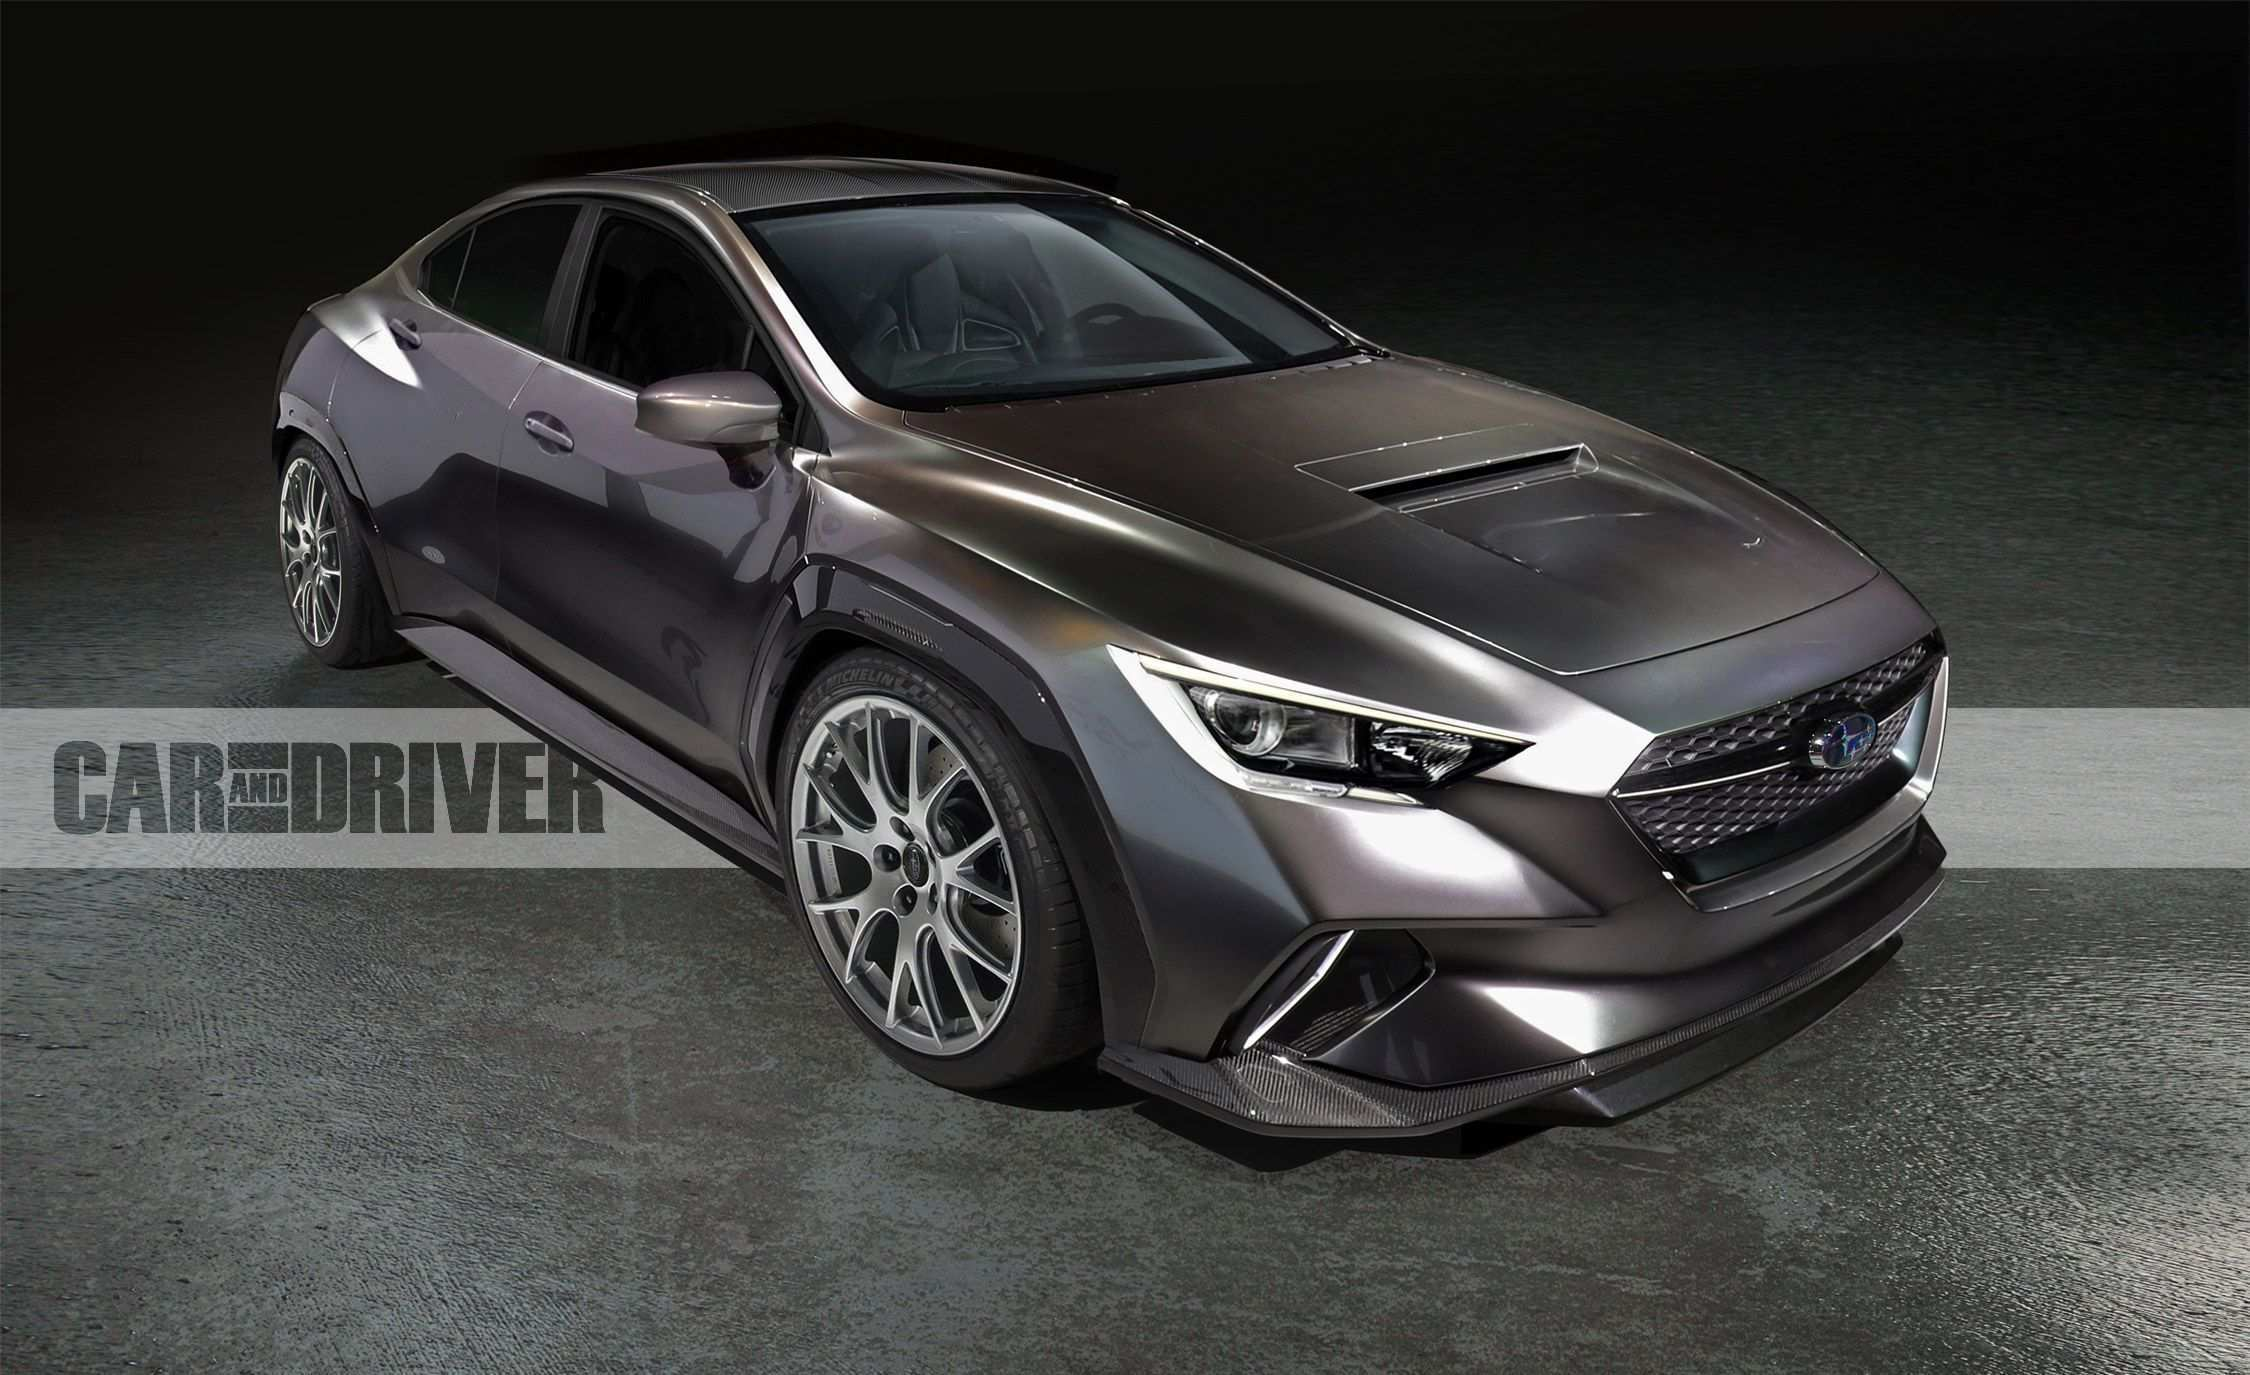 53 New 2020 Subaru Wrx News Rumors by 2020 Subaru Wrx News